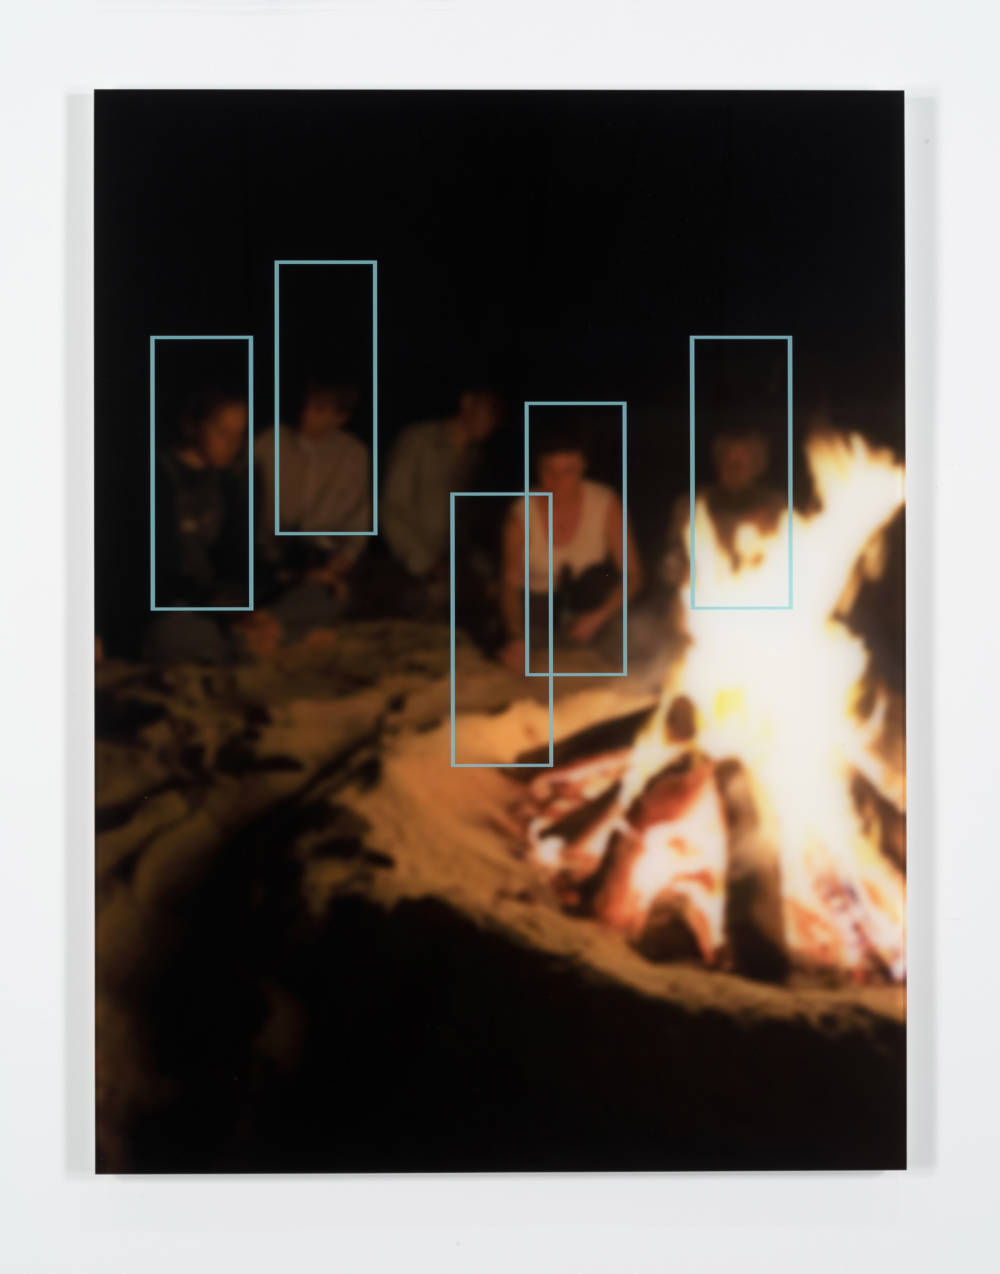 The Bonfire 2